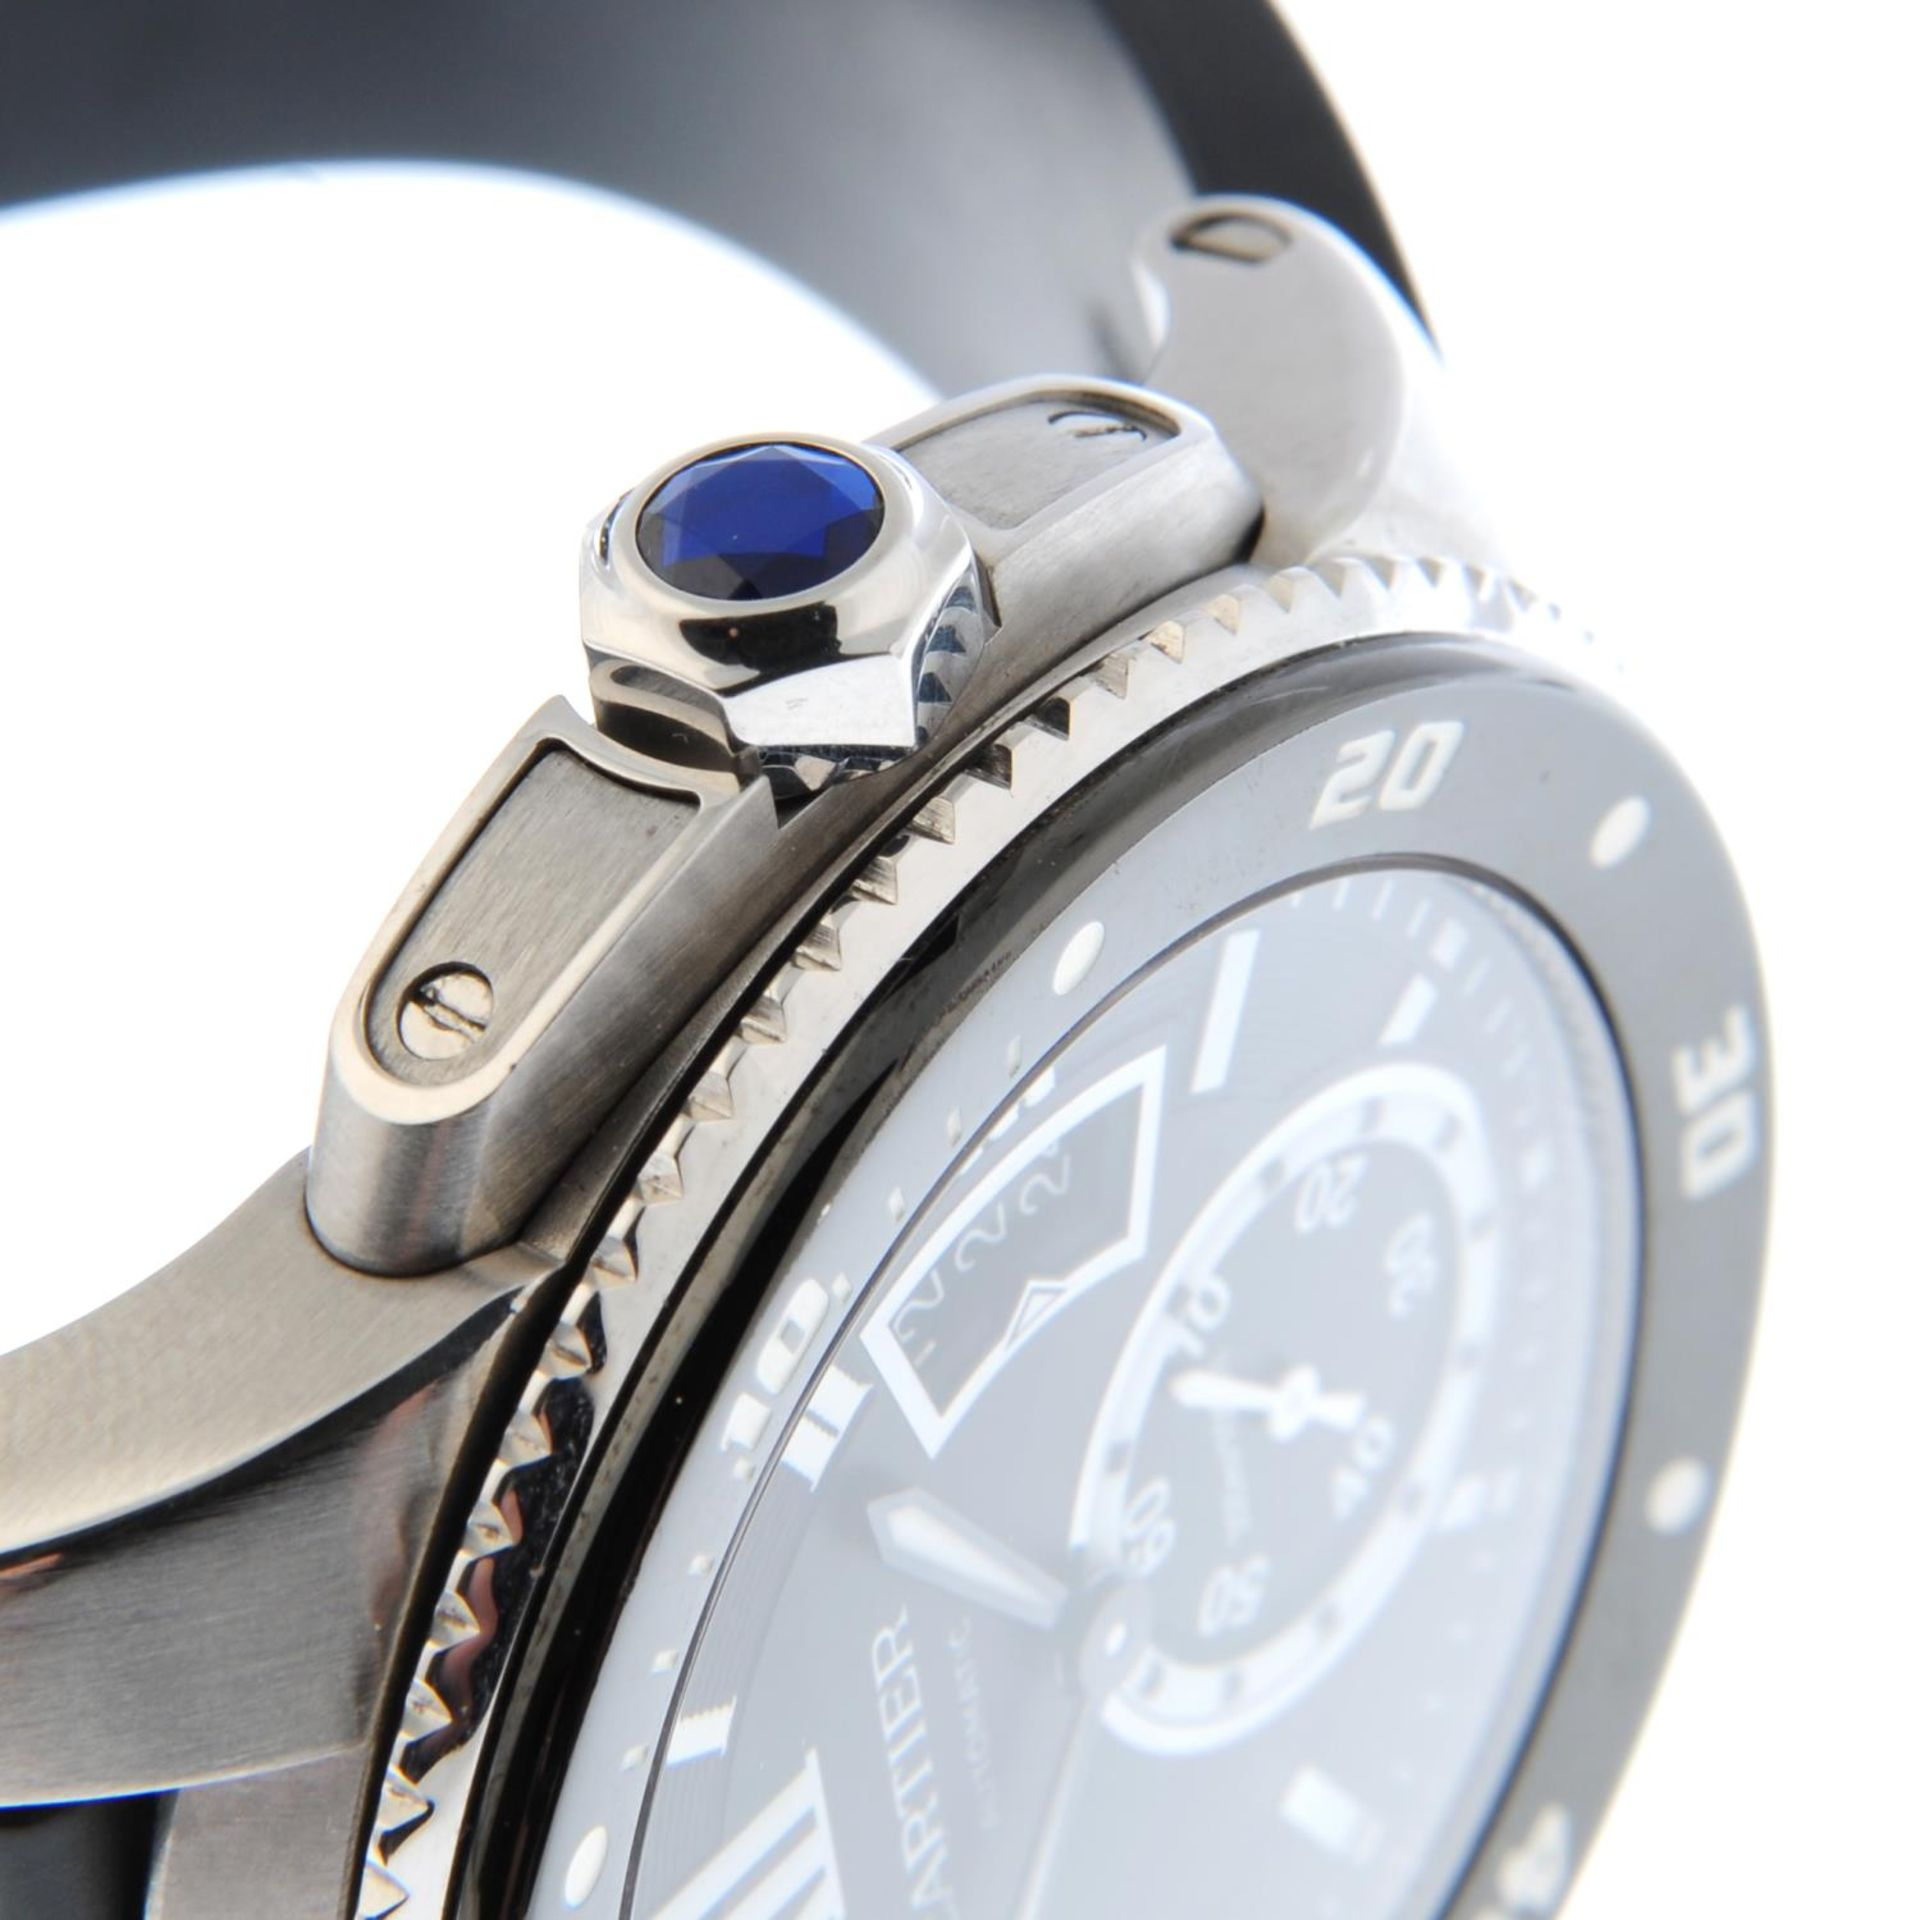 CARTIER - a Calibre de Cartier wrist watch. - Bild 5 aus 6